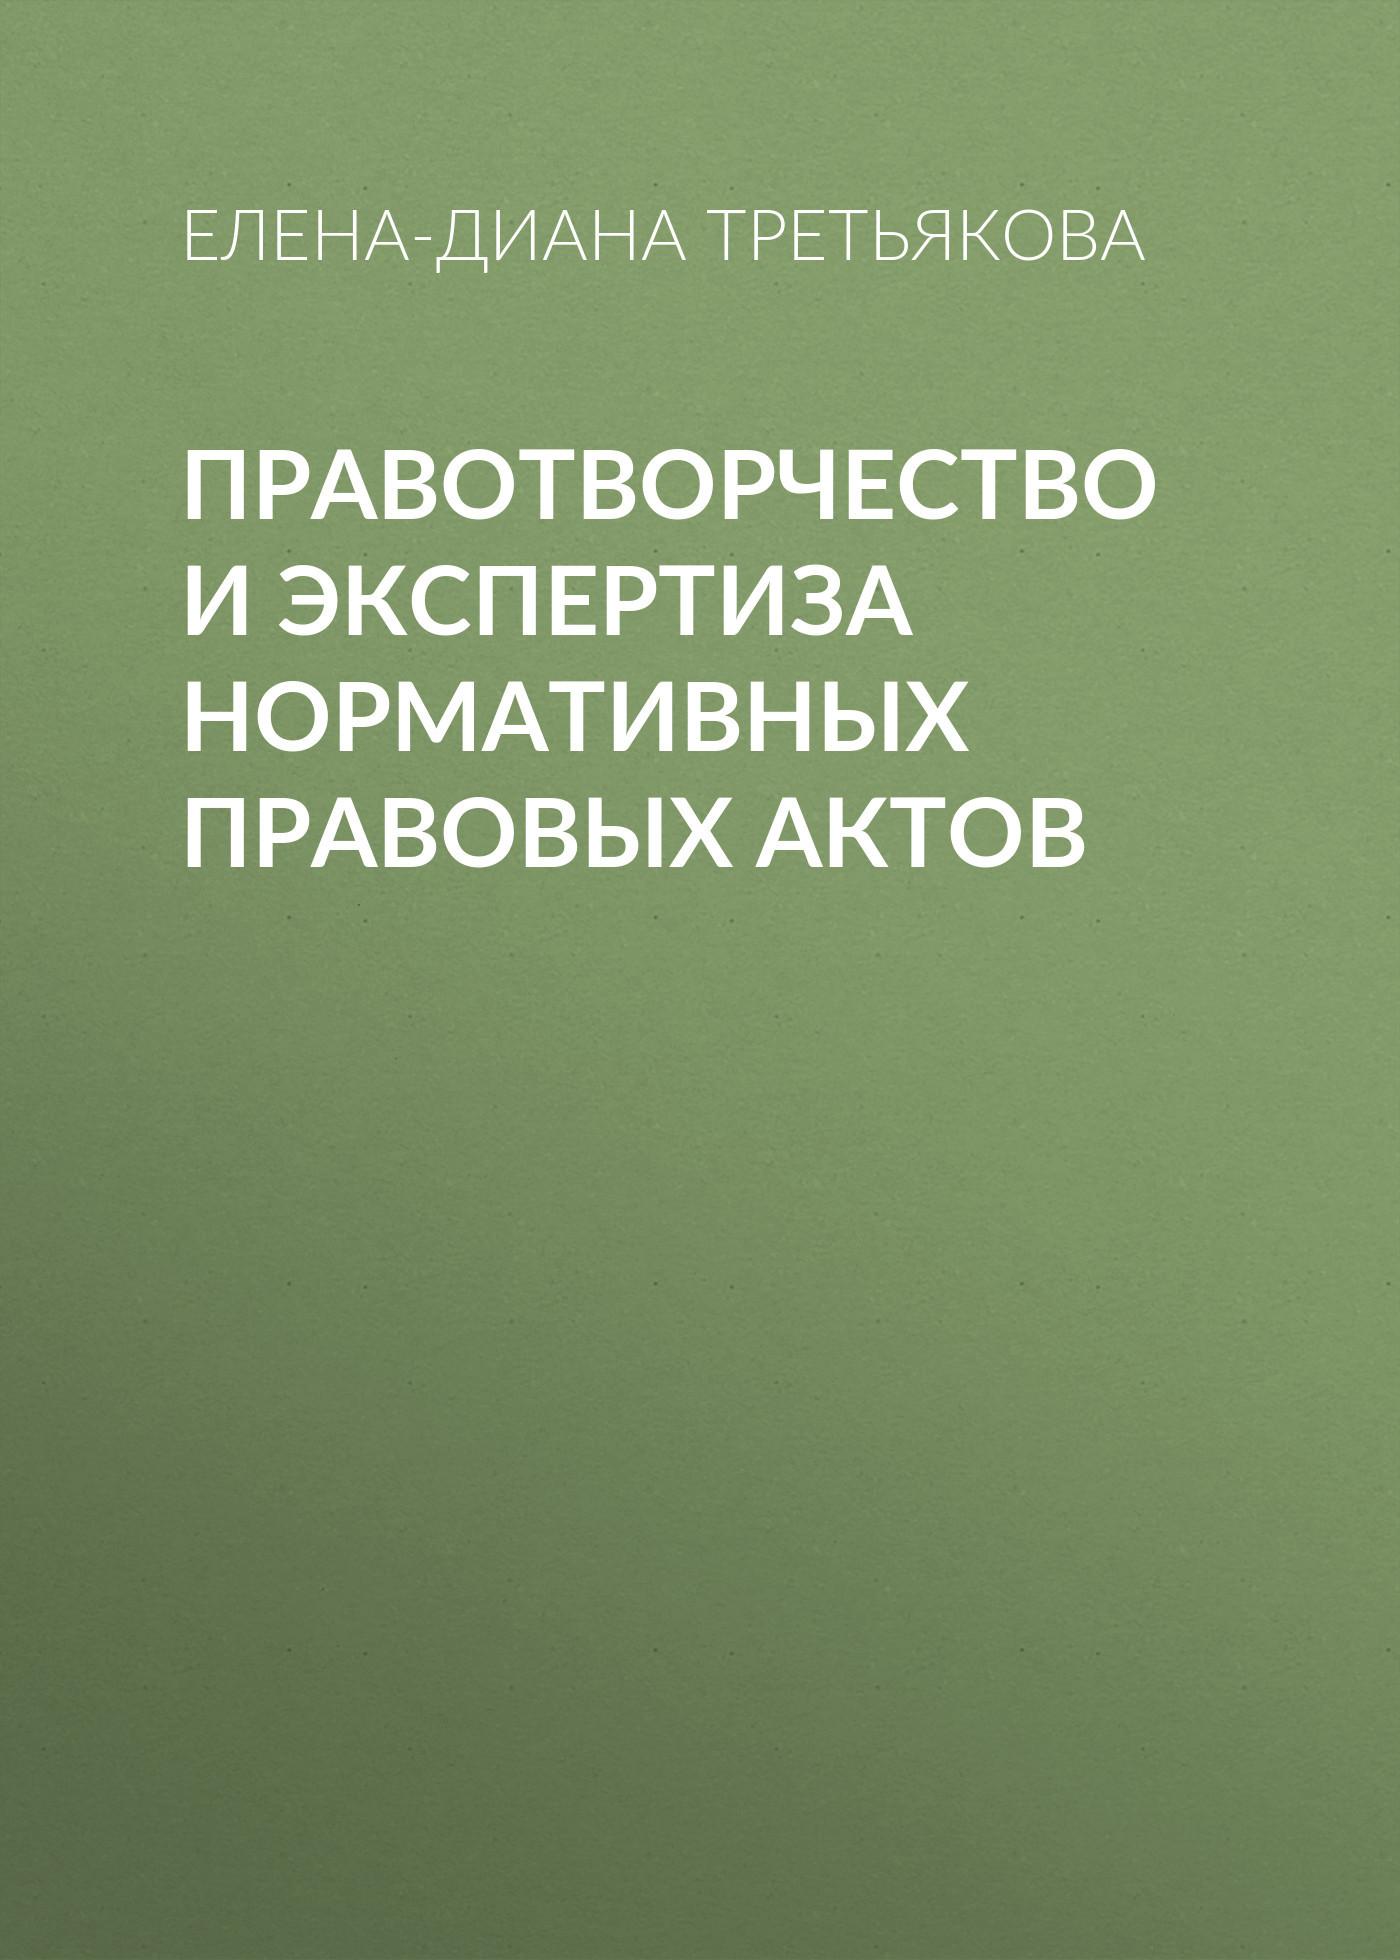 Елена-Диана Третьякова бесплатно